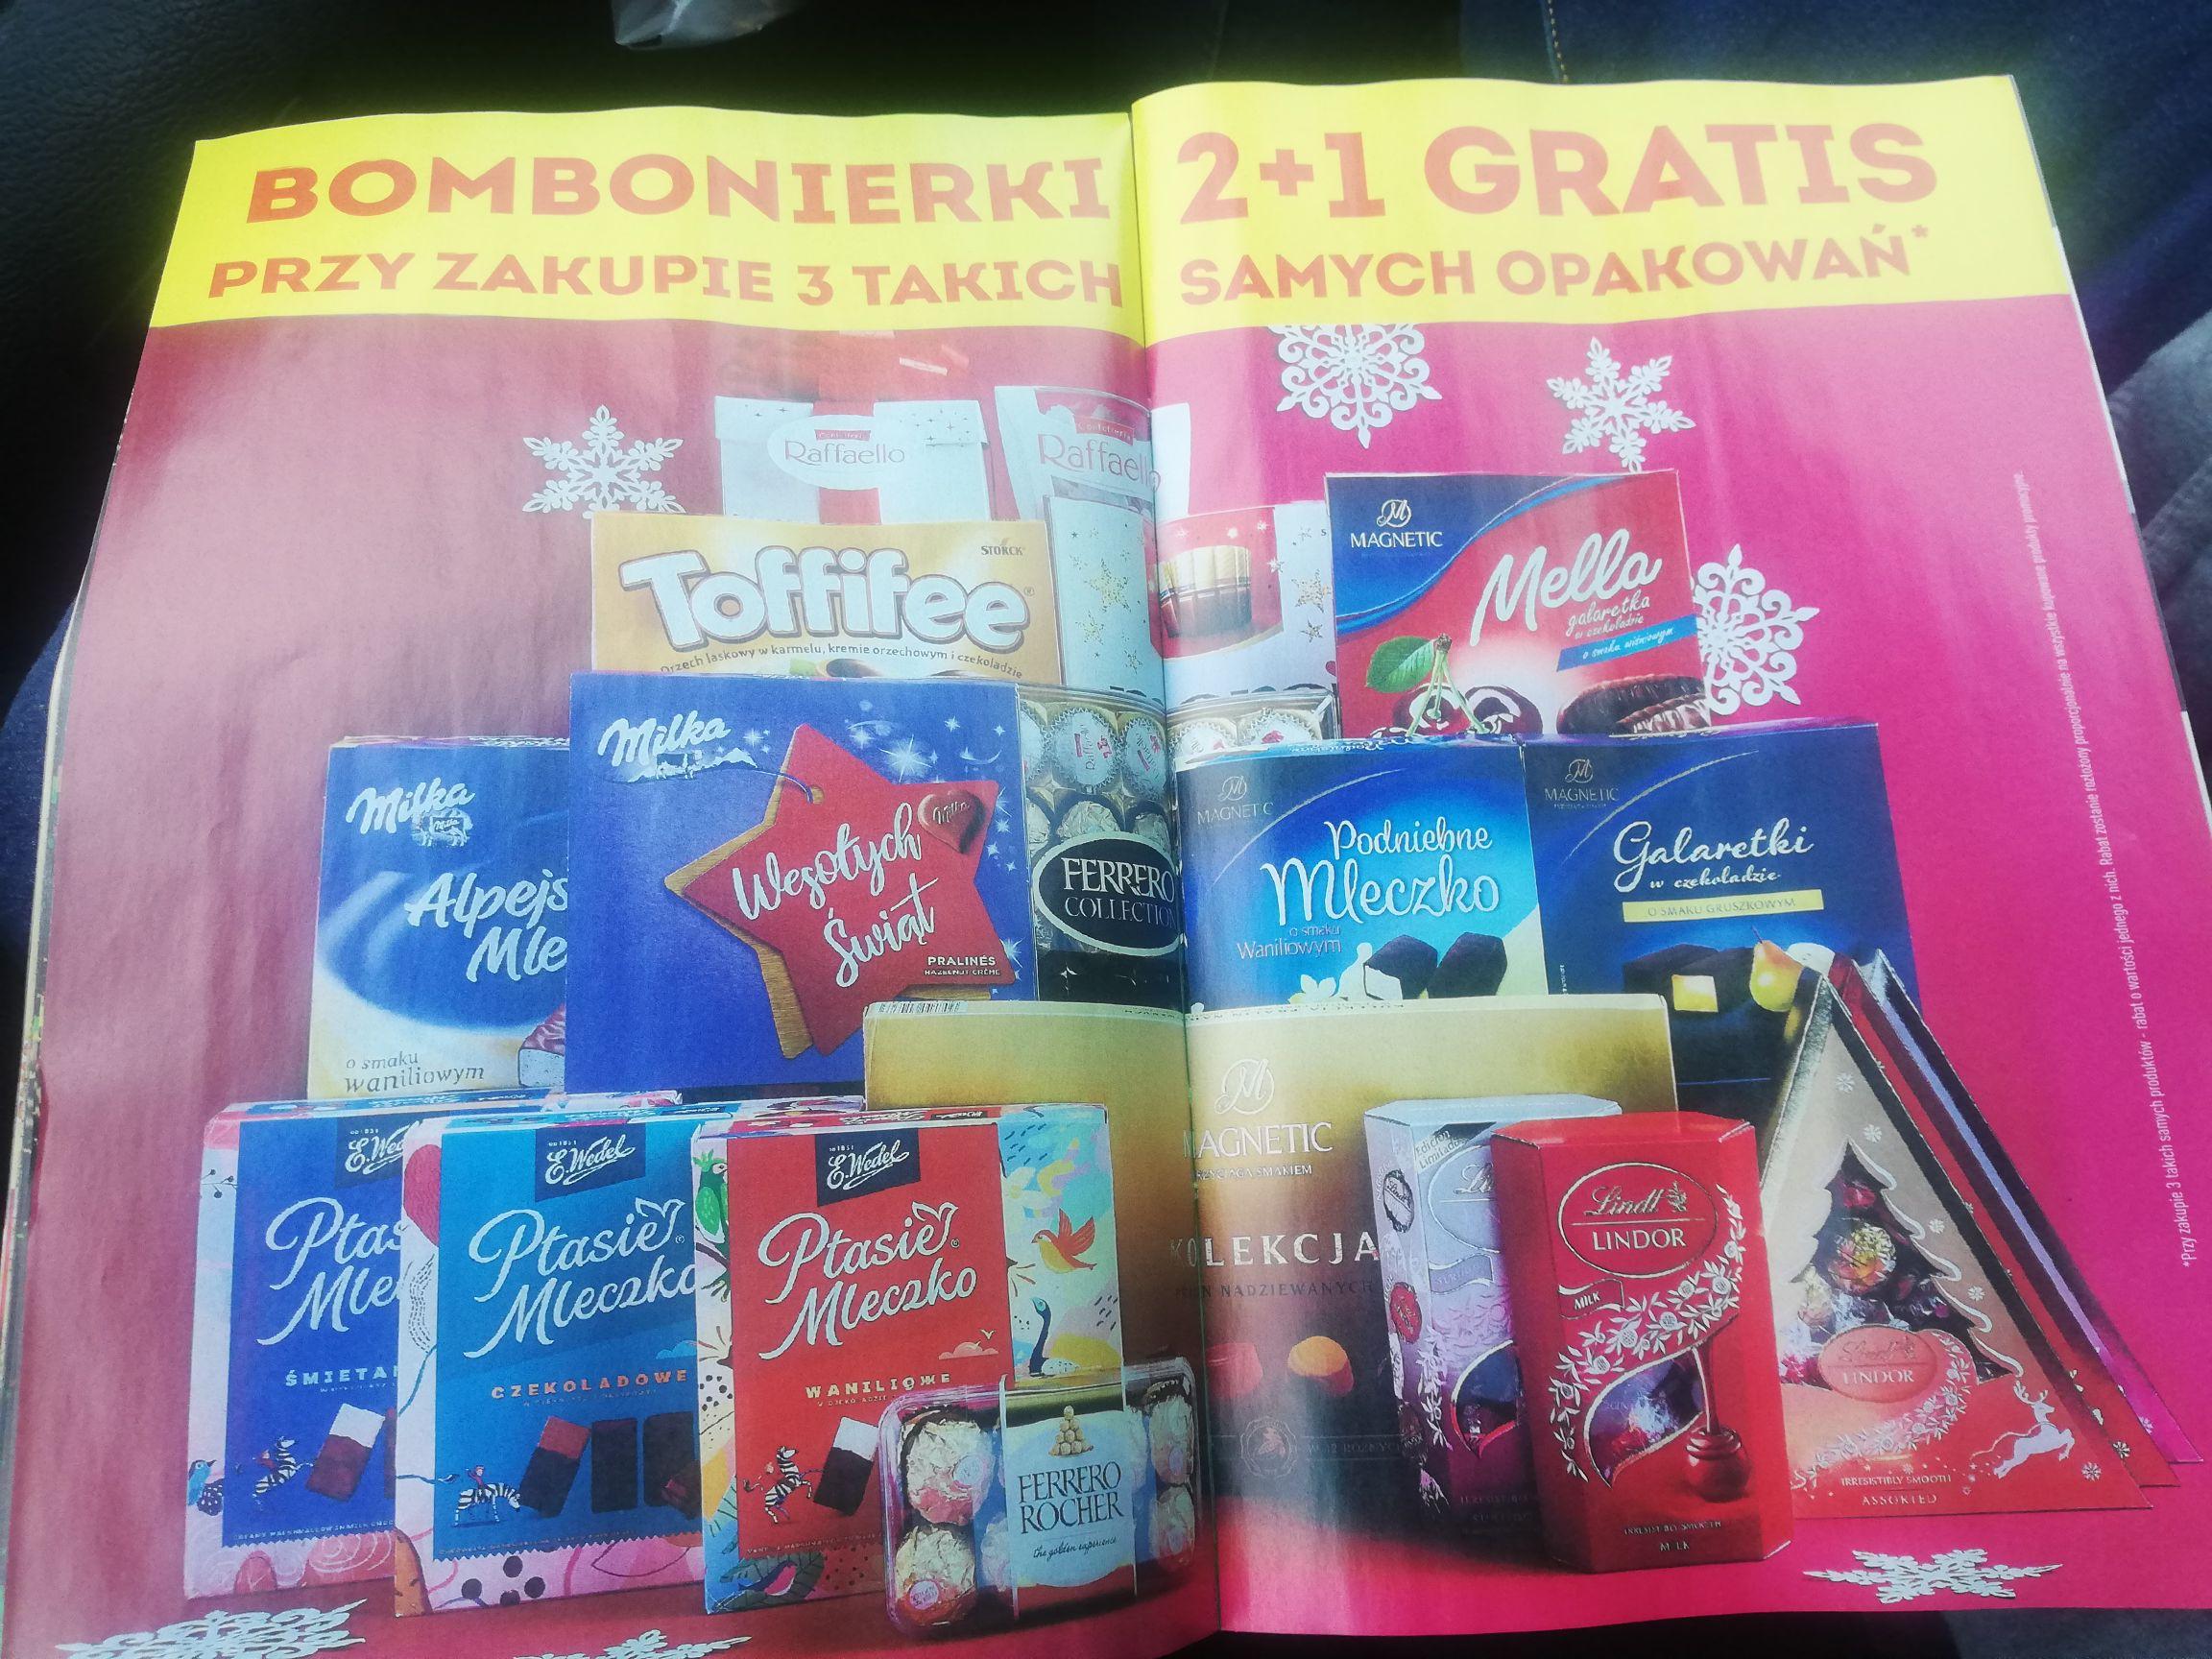 Bombonierki 2+1 gratis Biedronka